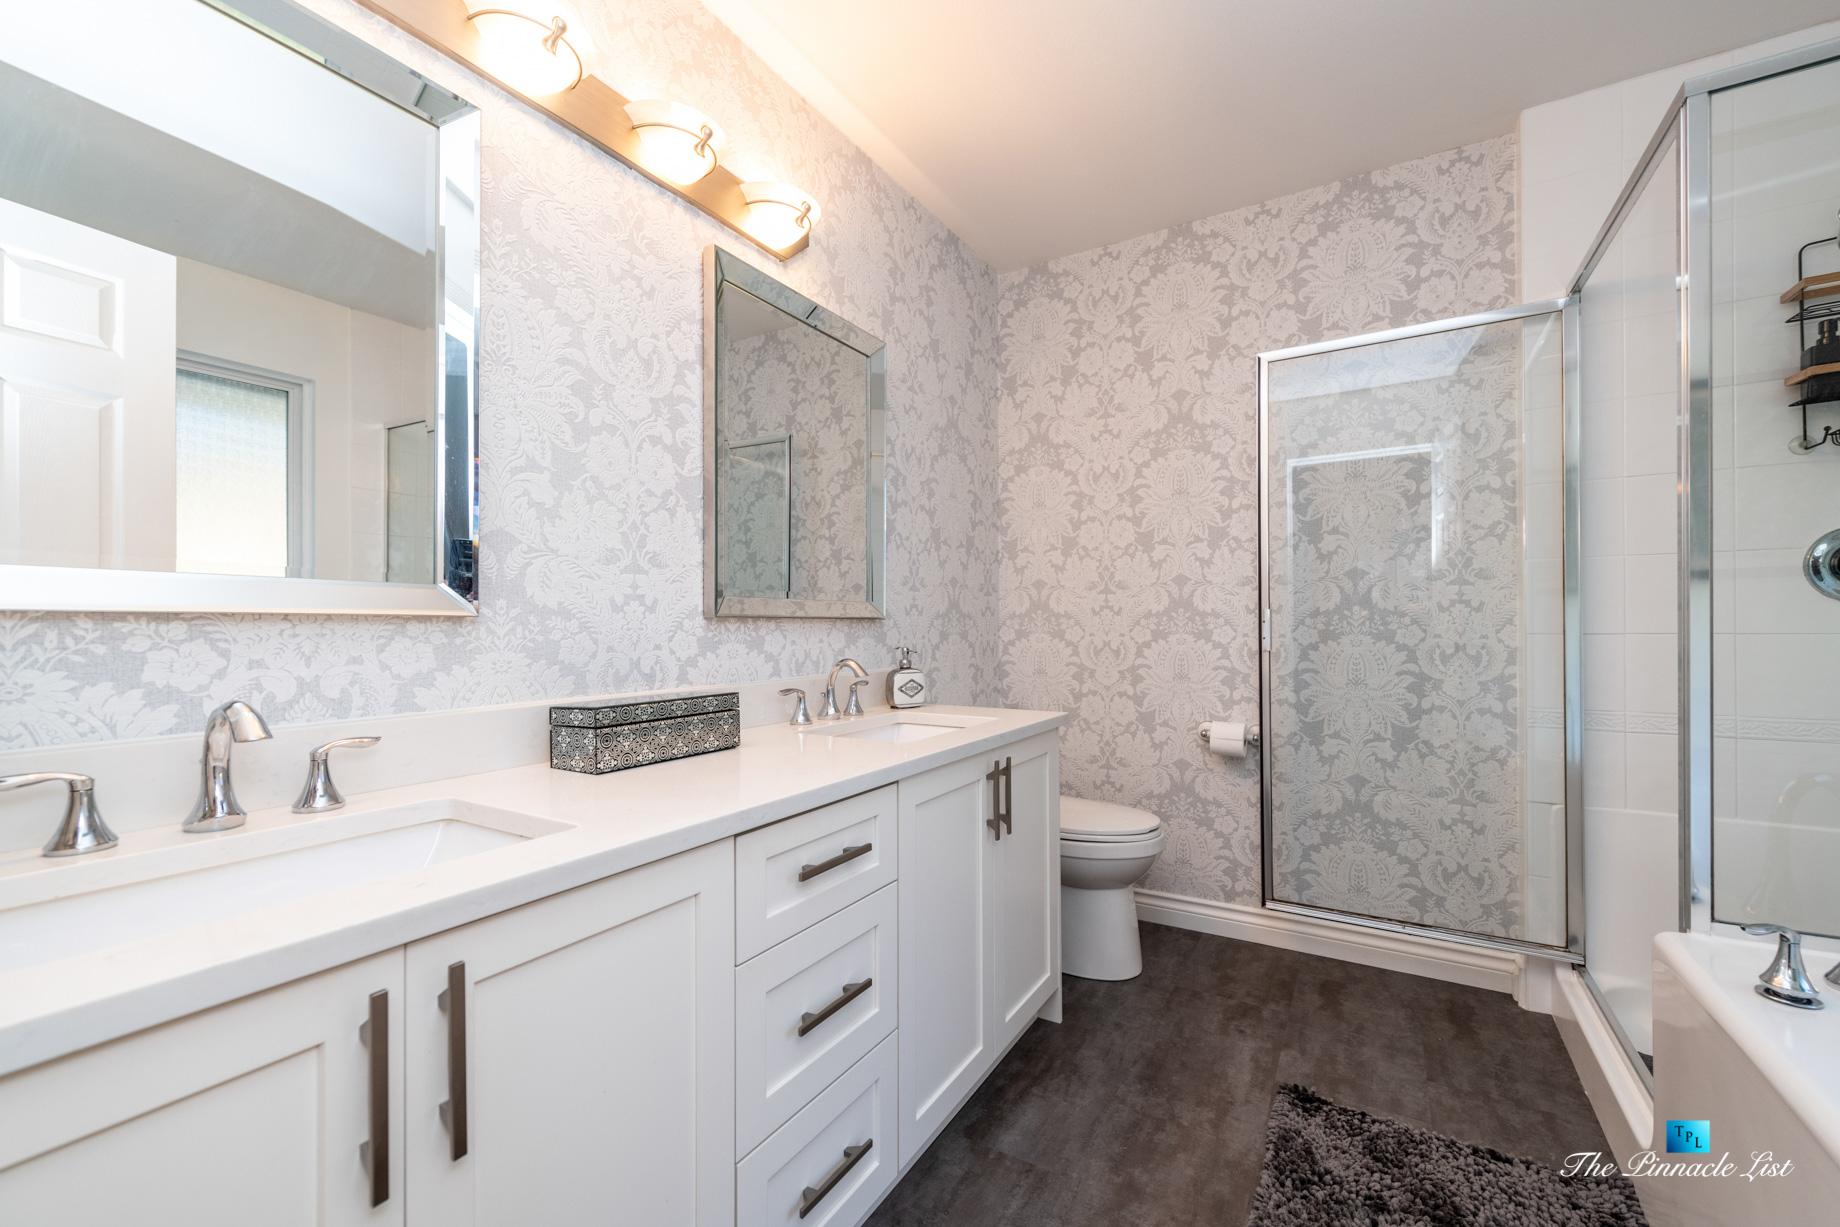 2366 Sunnyside Rd, Anmore, BC, Canada – Master Bathroom